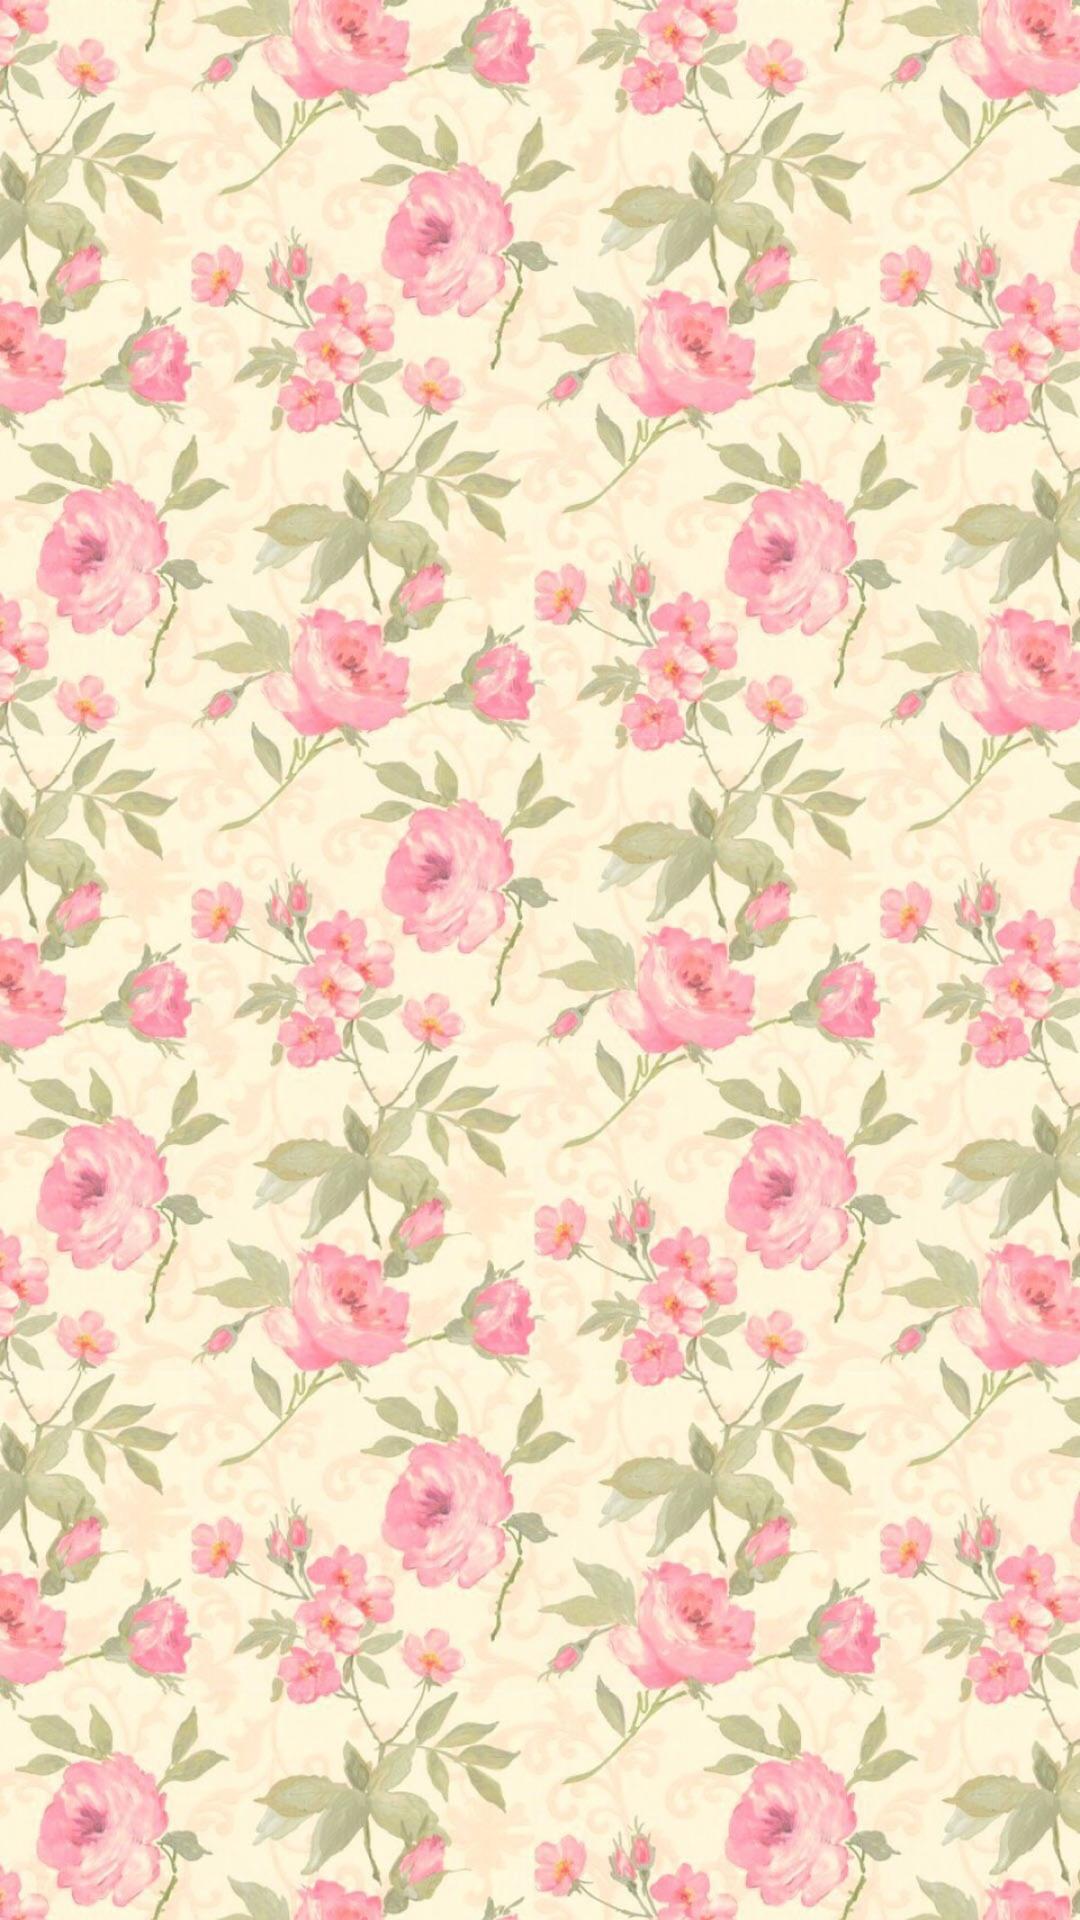 Desktop Wallpaper Fall Flowers Free Cute Phone Wallpapers Backgrounds Pixelstalk Net